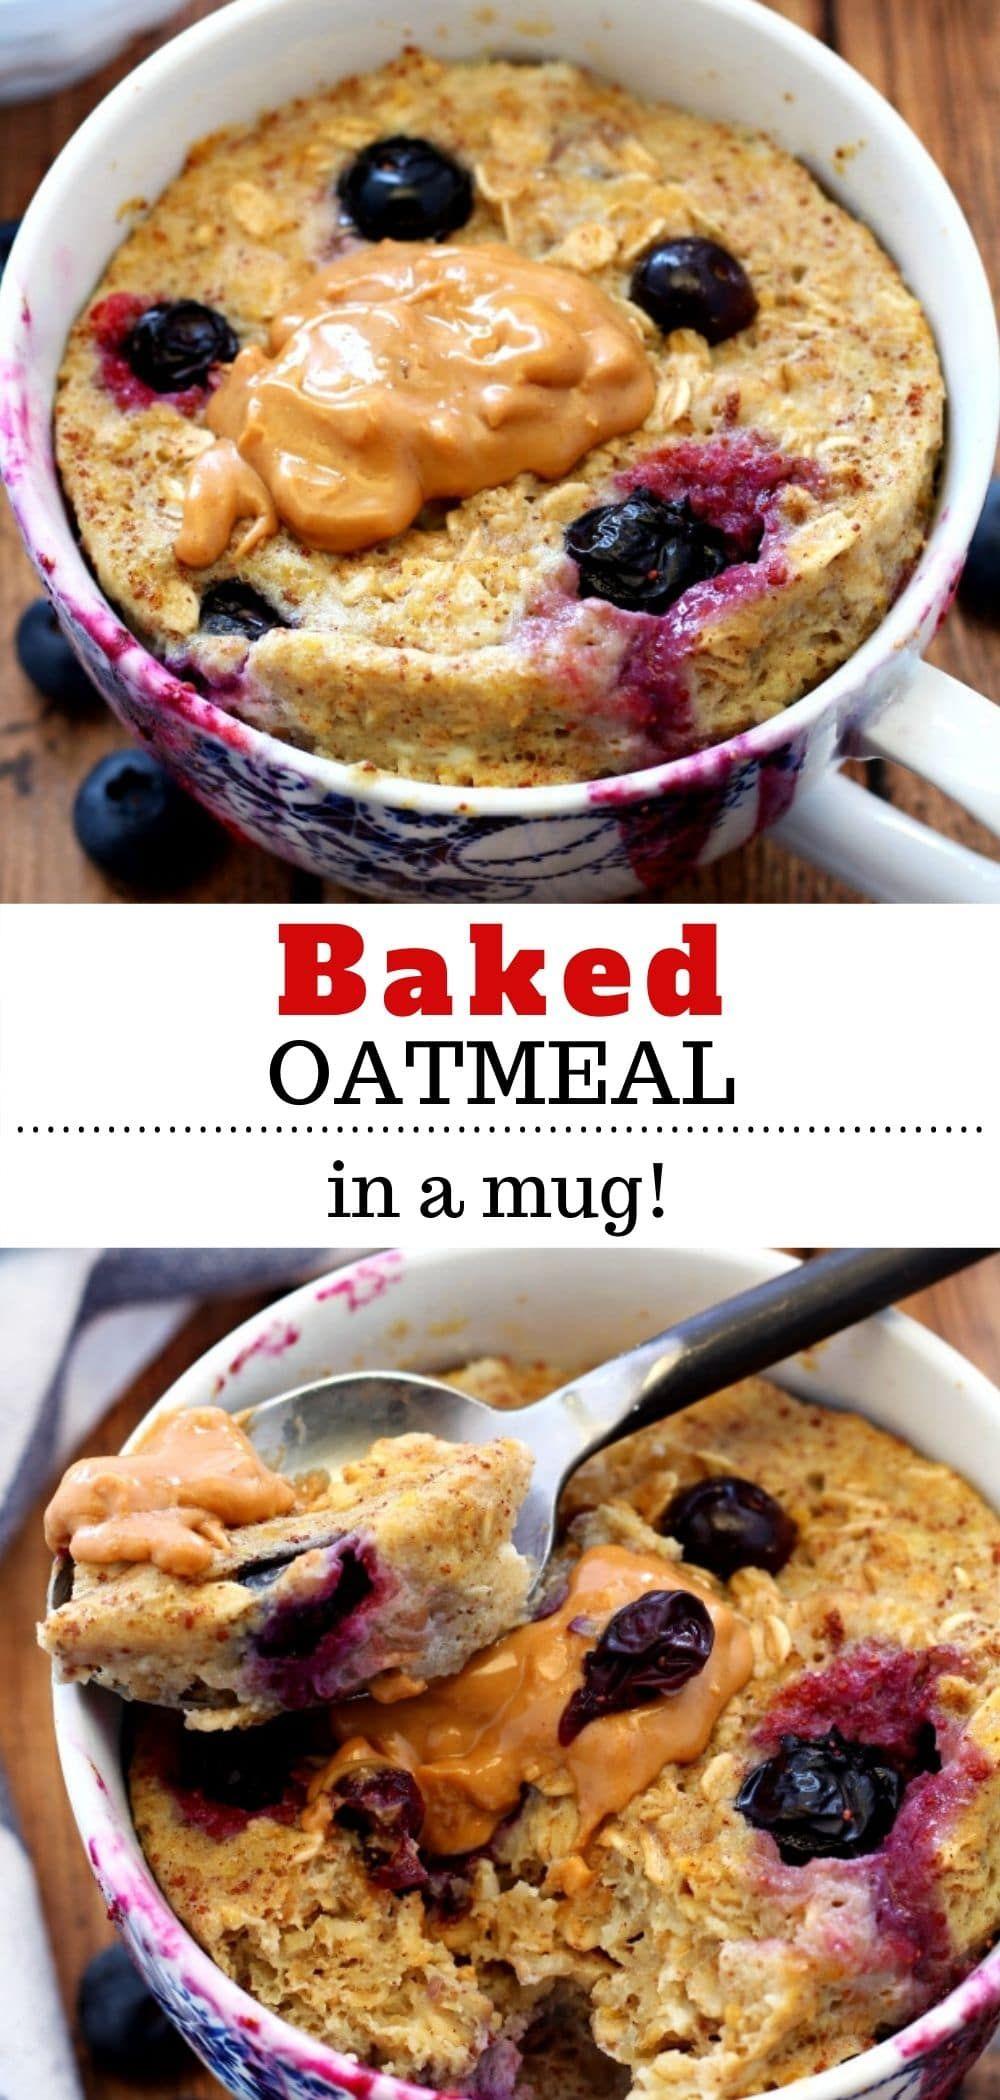 Blueberry banana microwave baked oatmeal in a mug recipe